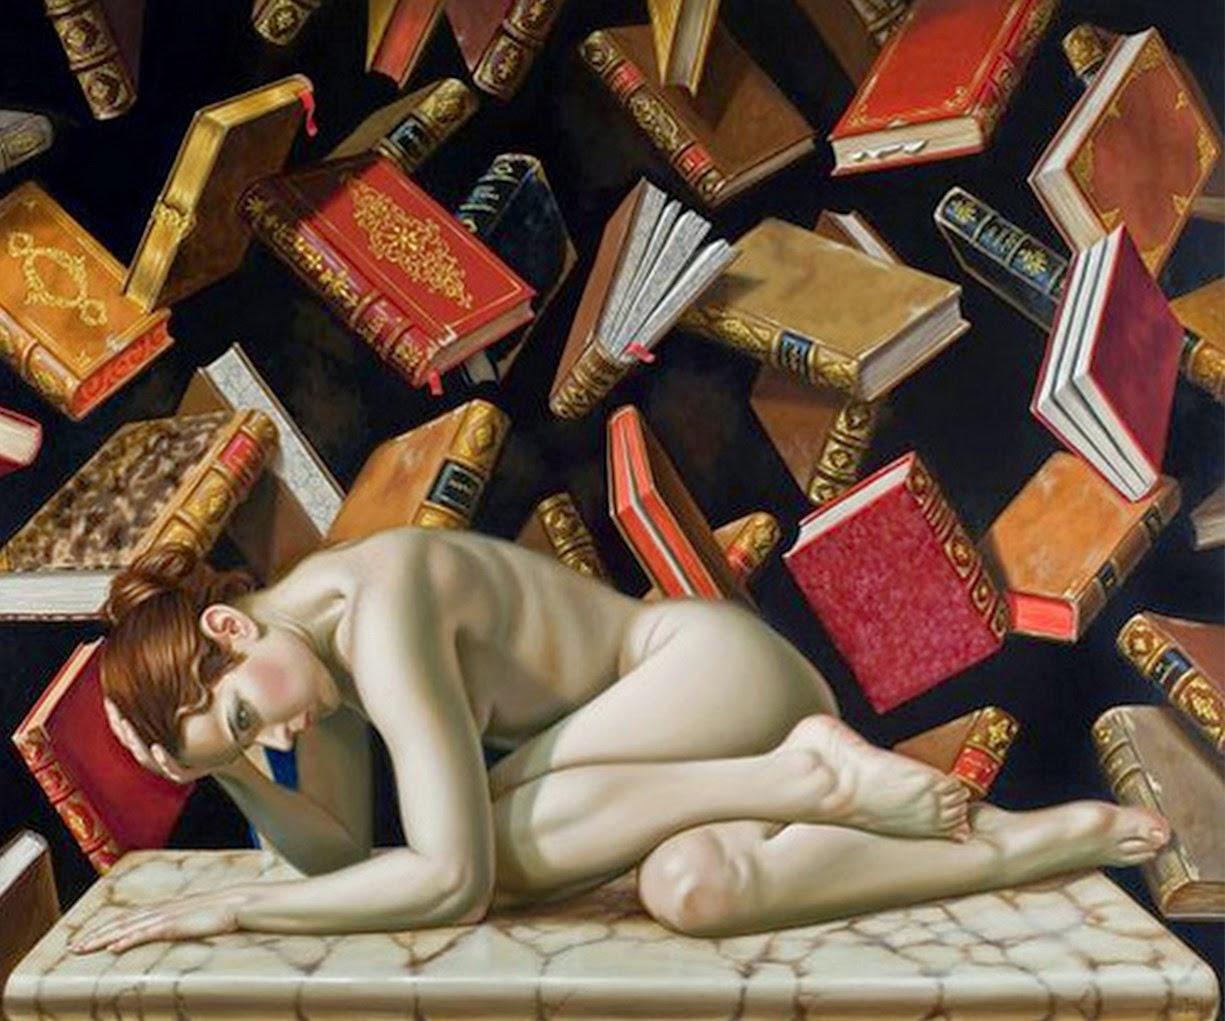 desnudos-femeninos-pintados-al-oleo-sobre-lienzo